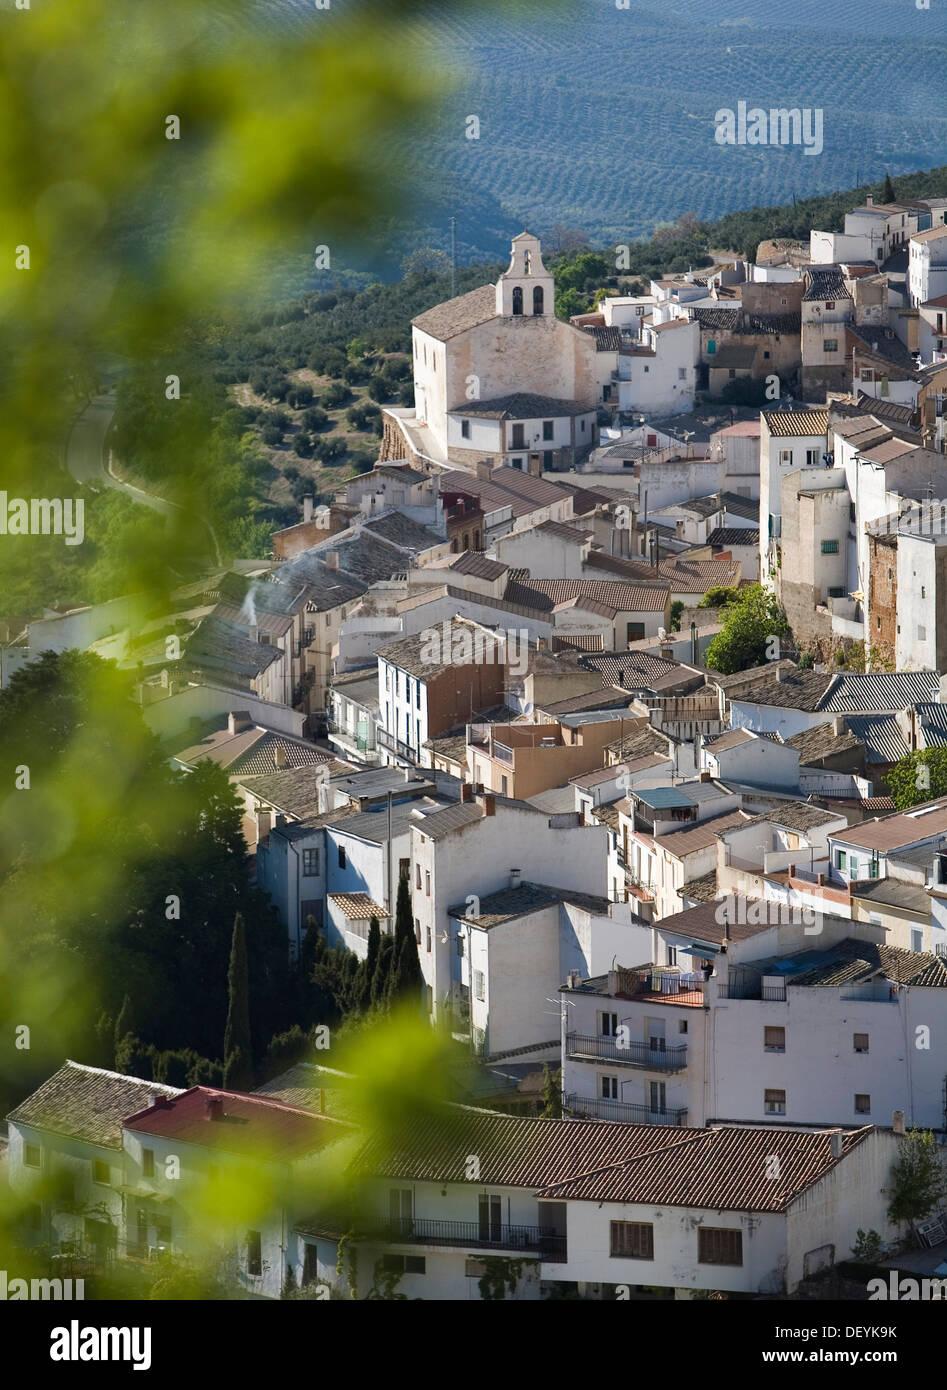 Torres village, Sierra Mágina Natural Park, Jaén, Spain, Europe - Stock Image